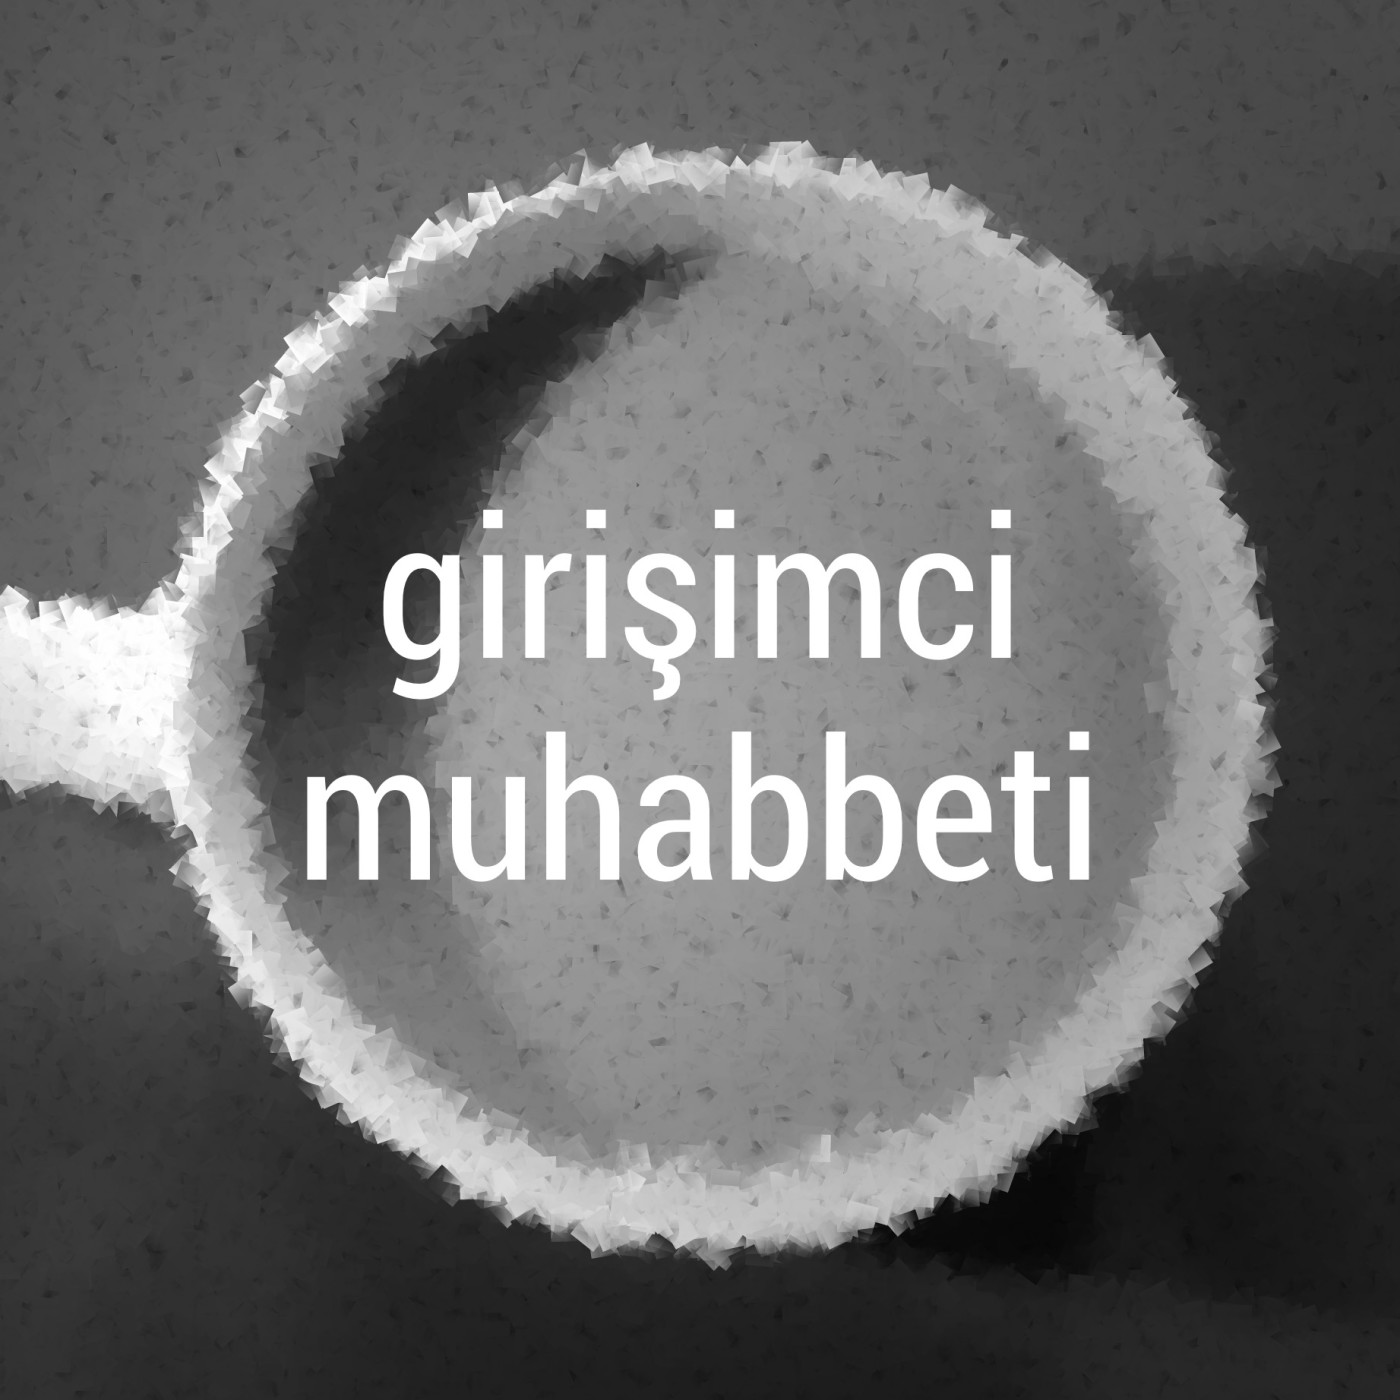 GirisimciMuhabbeti